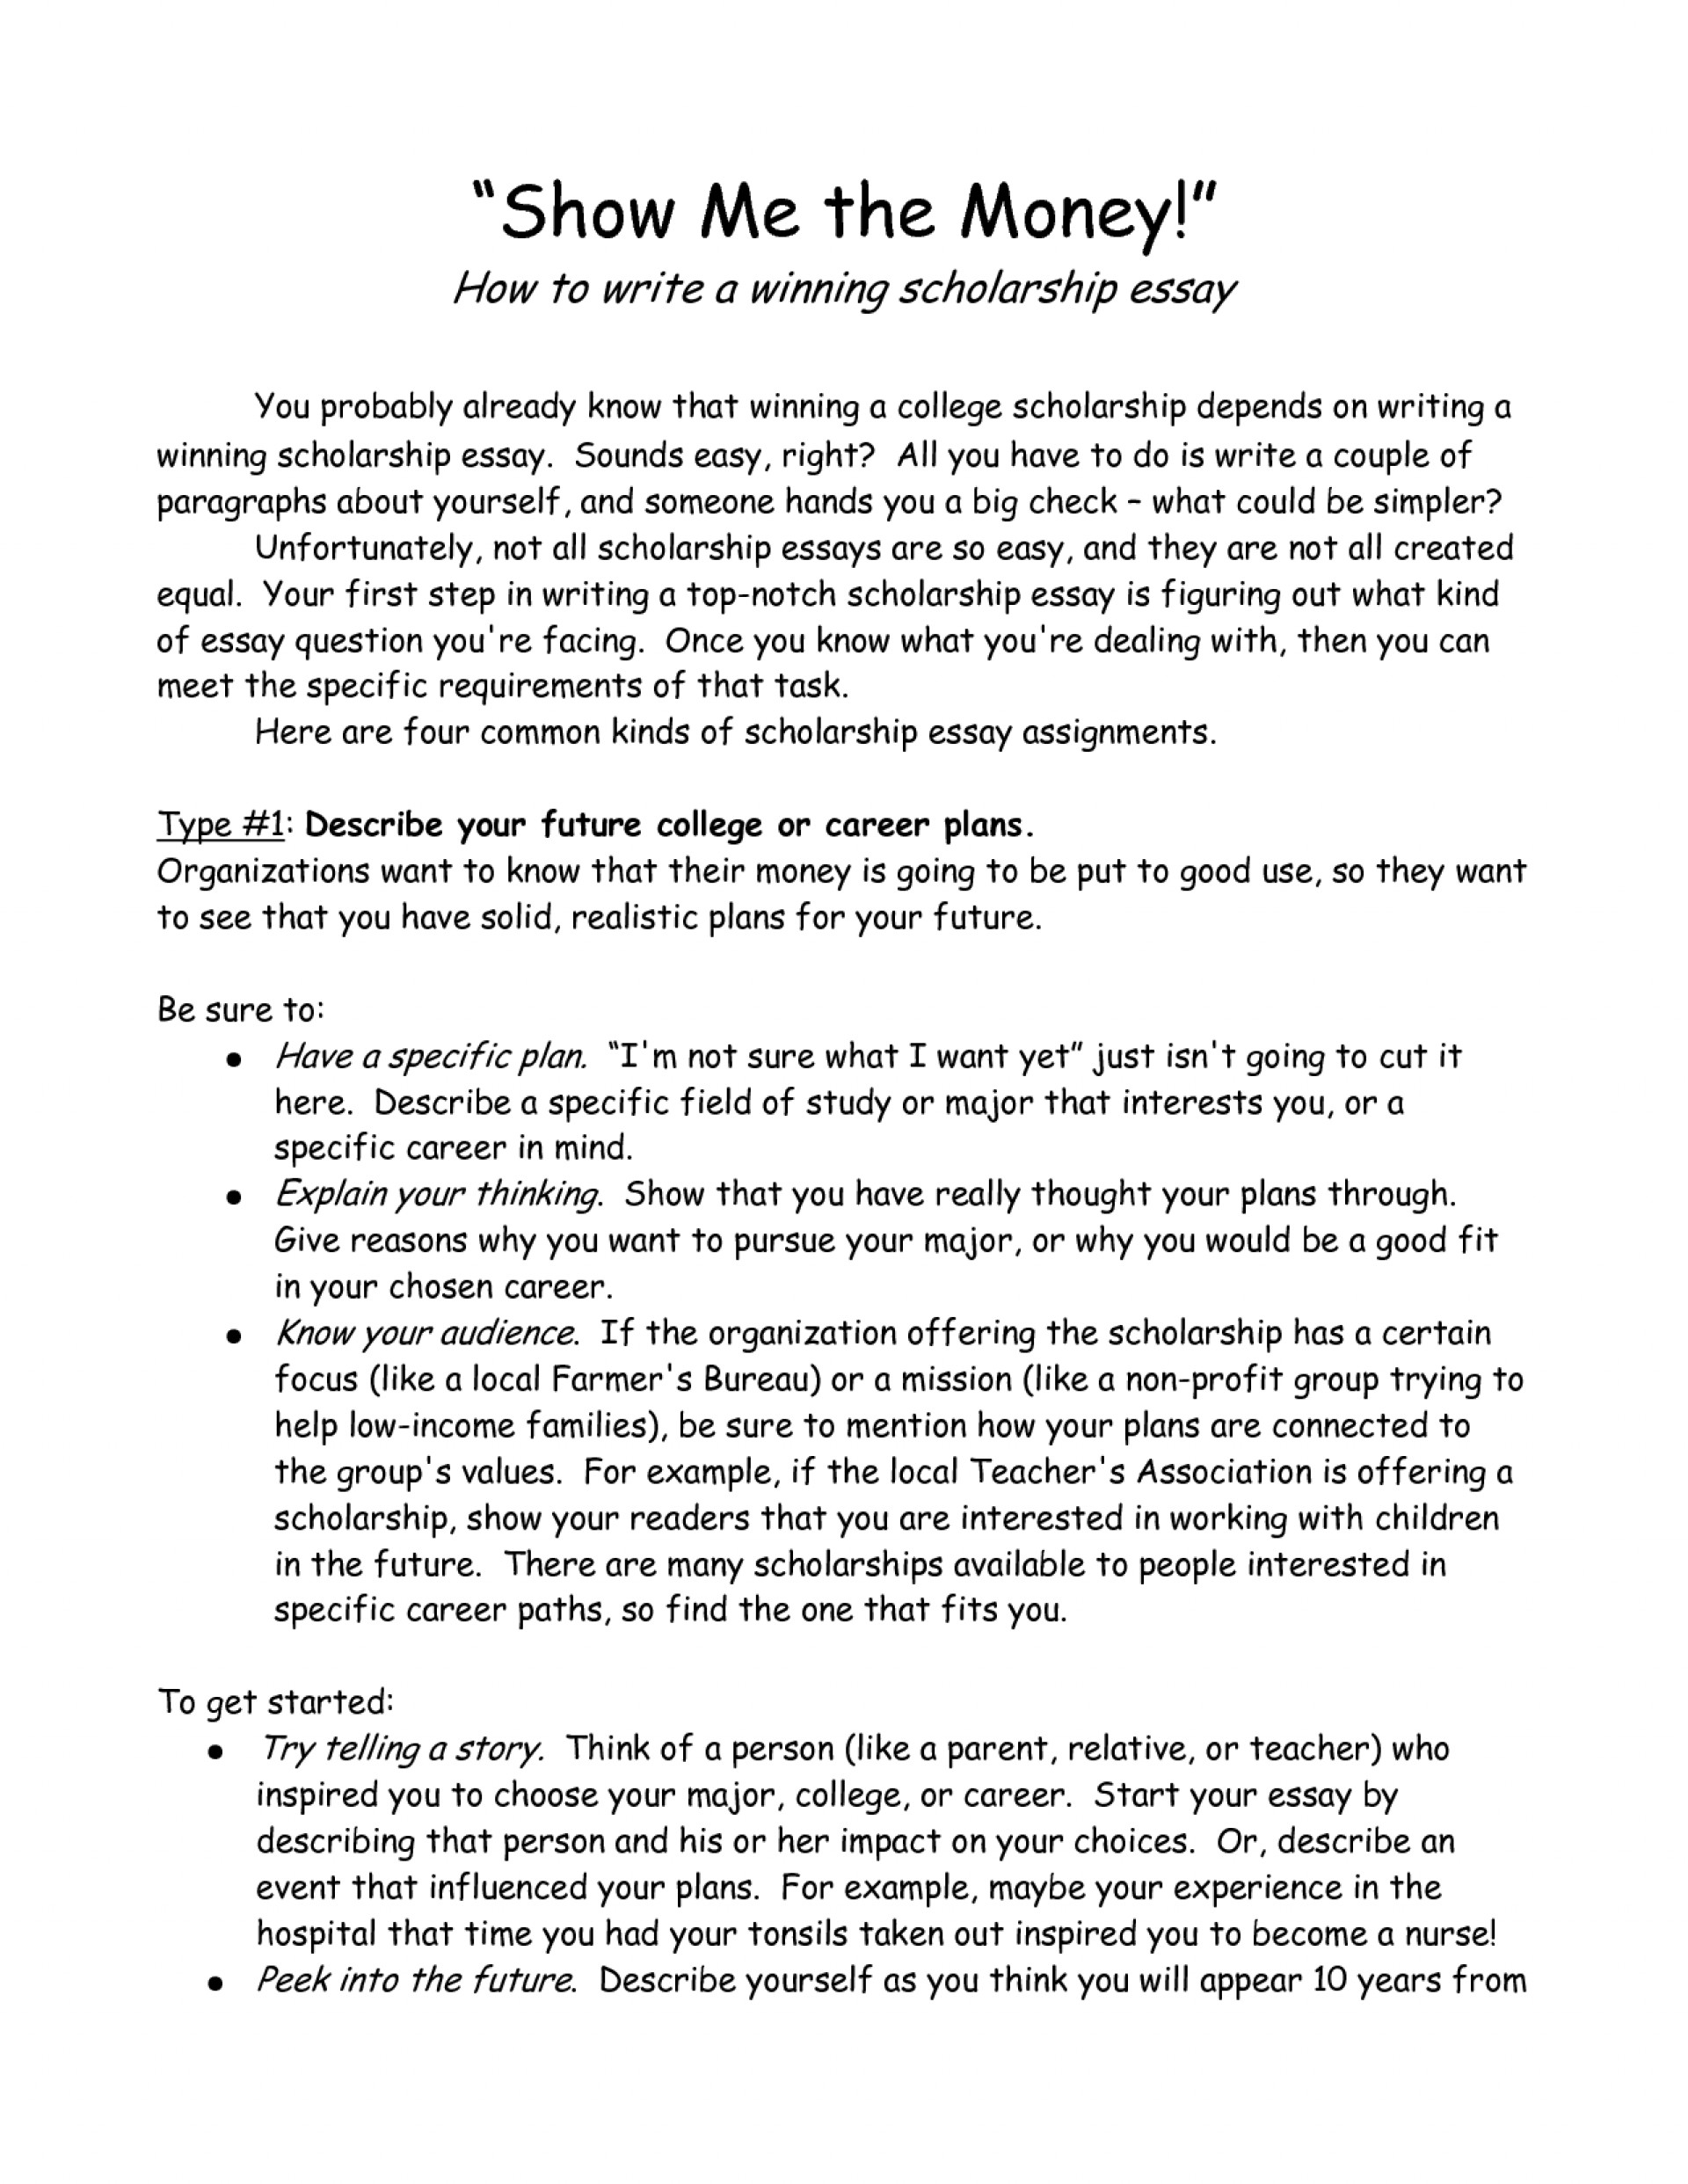 003 Scholarship Essay Tips Example Singular Gilman Psc Goldwater 1920